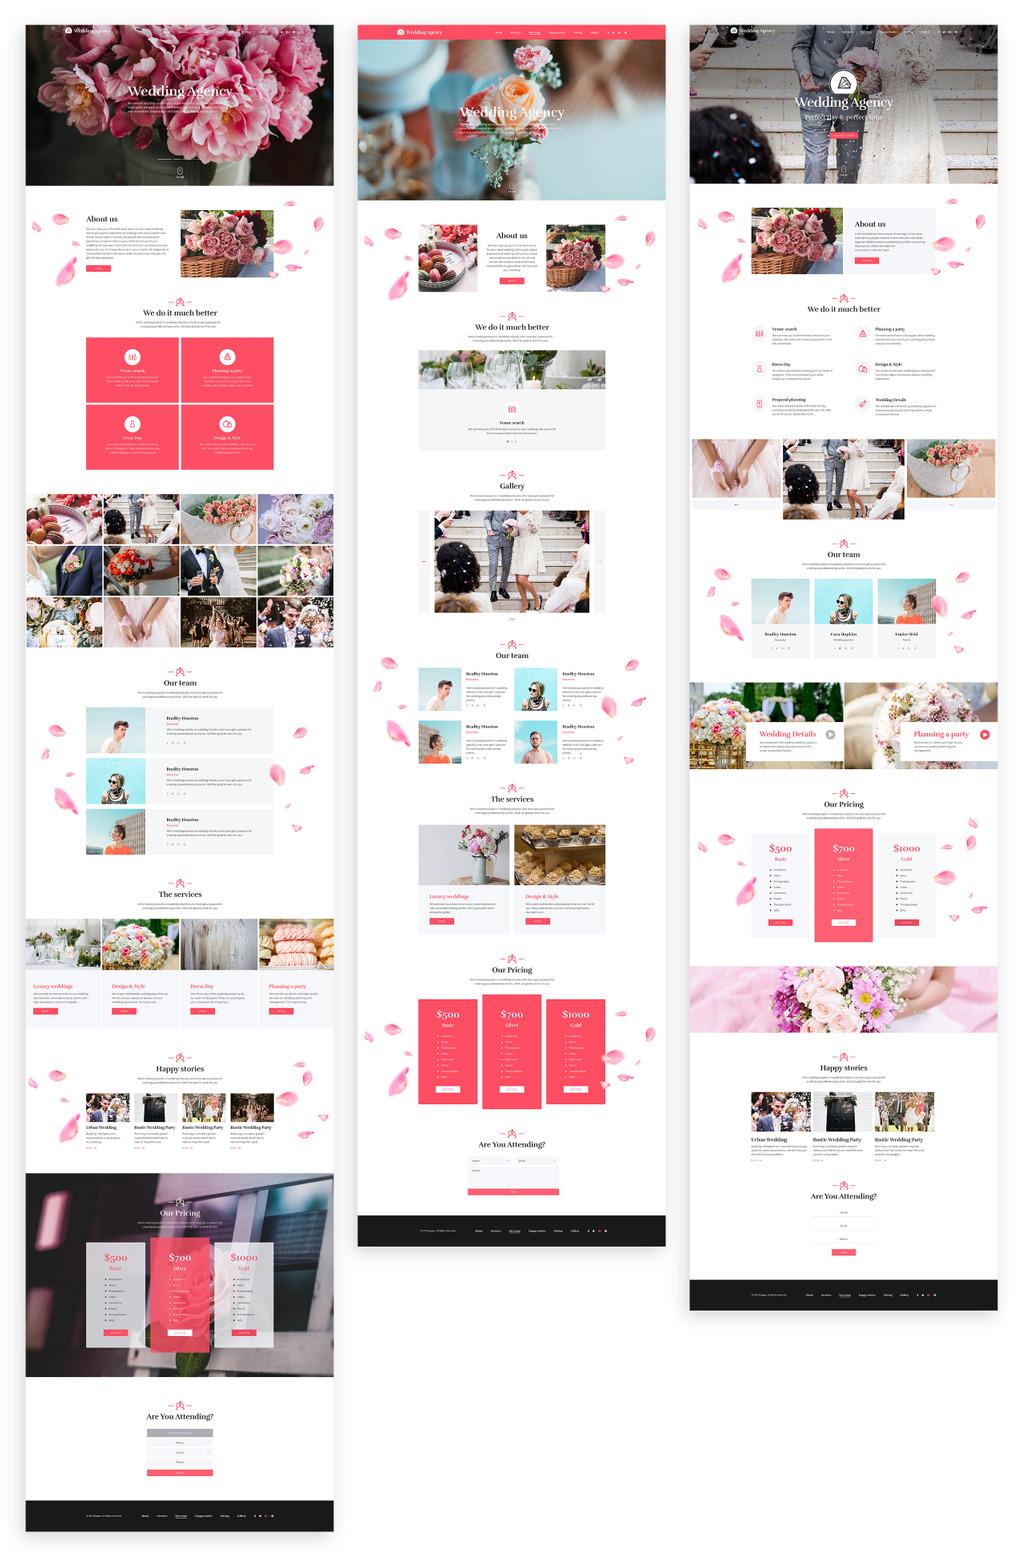 Honeymoon - Wedding Agency HTML Landing Page Template #68332